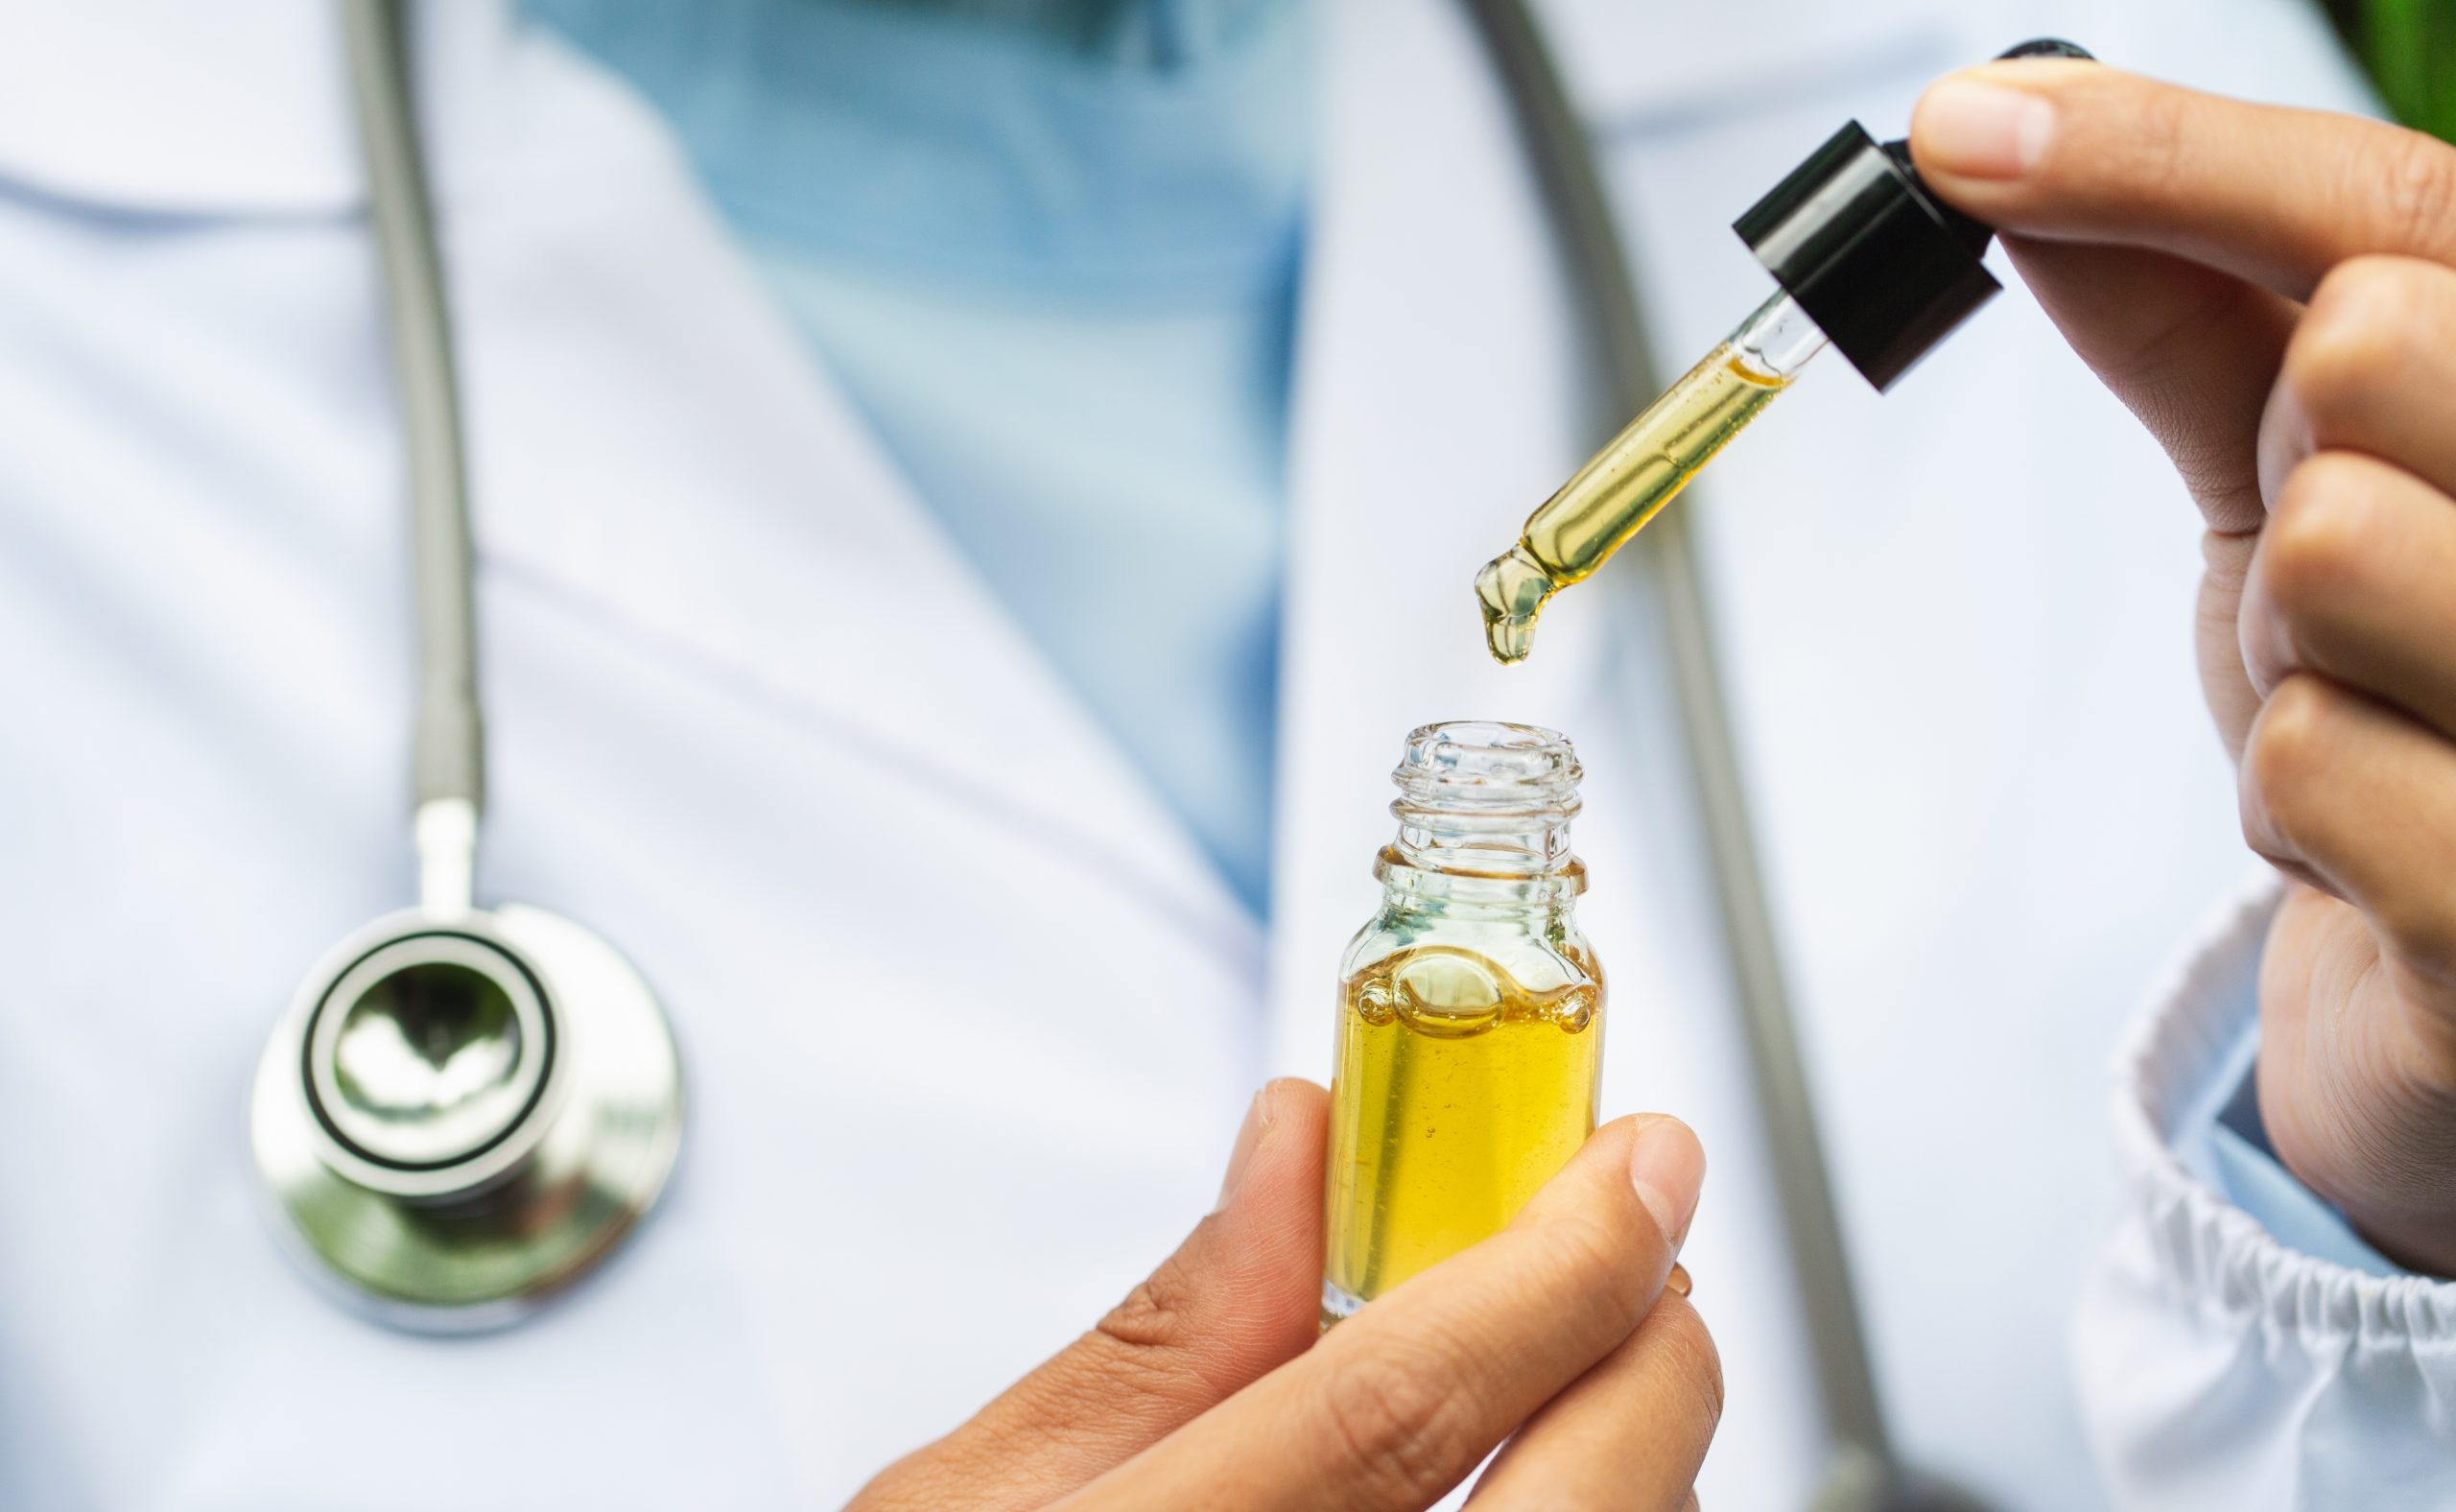 CBD Hemp oil, Doctor holding a bottle of hemp oil, Medical marijuana products including cannabis leaf, cbd and hash oil, alternative medicine